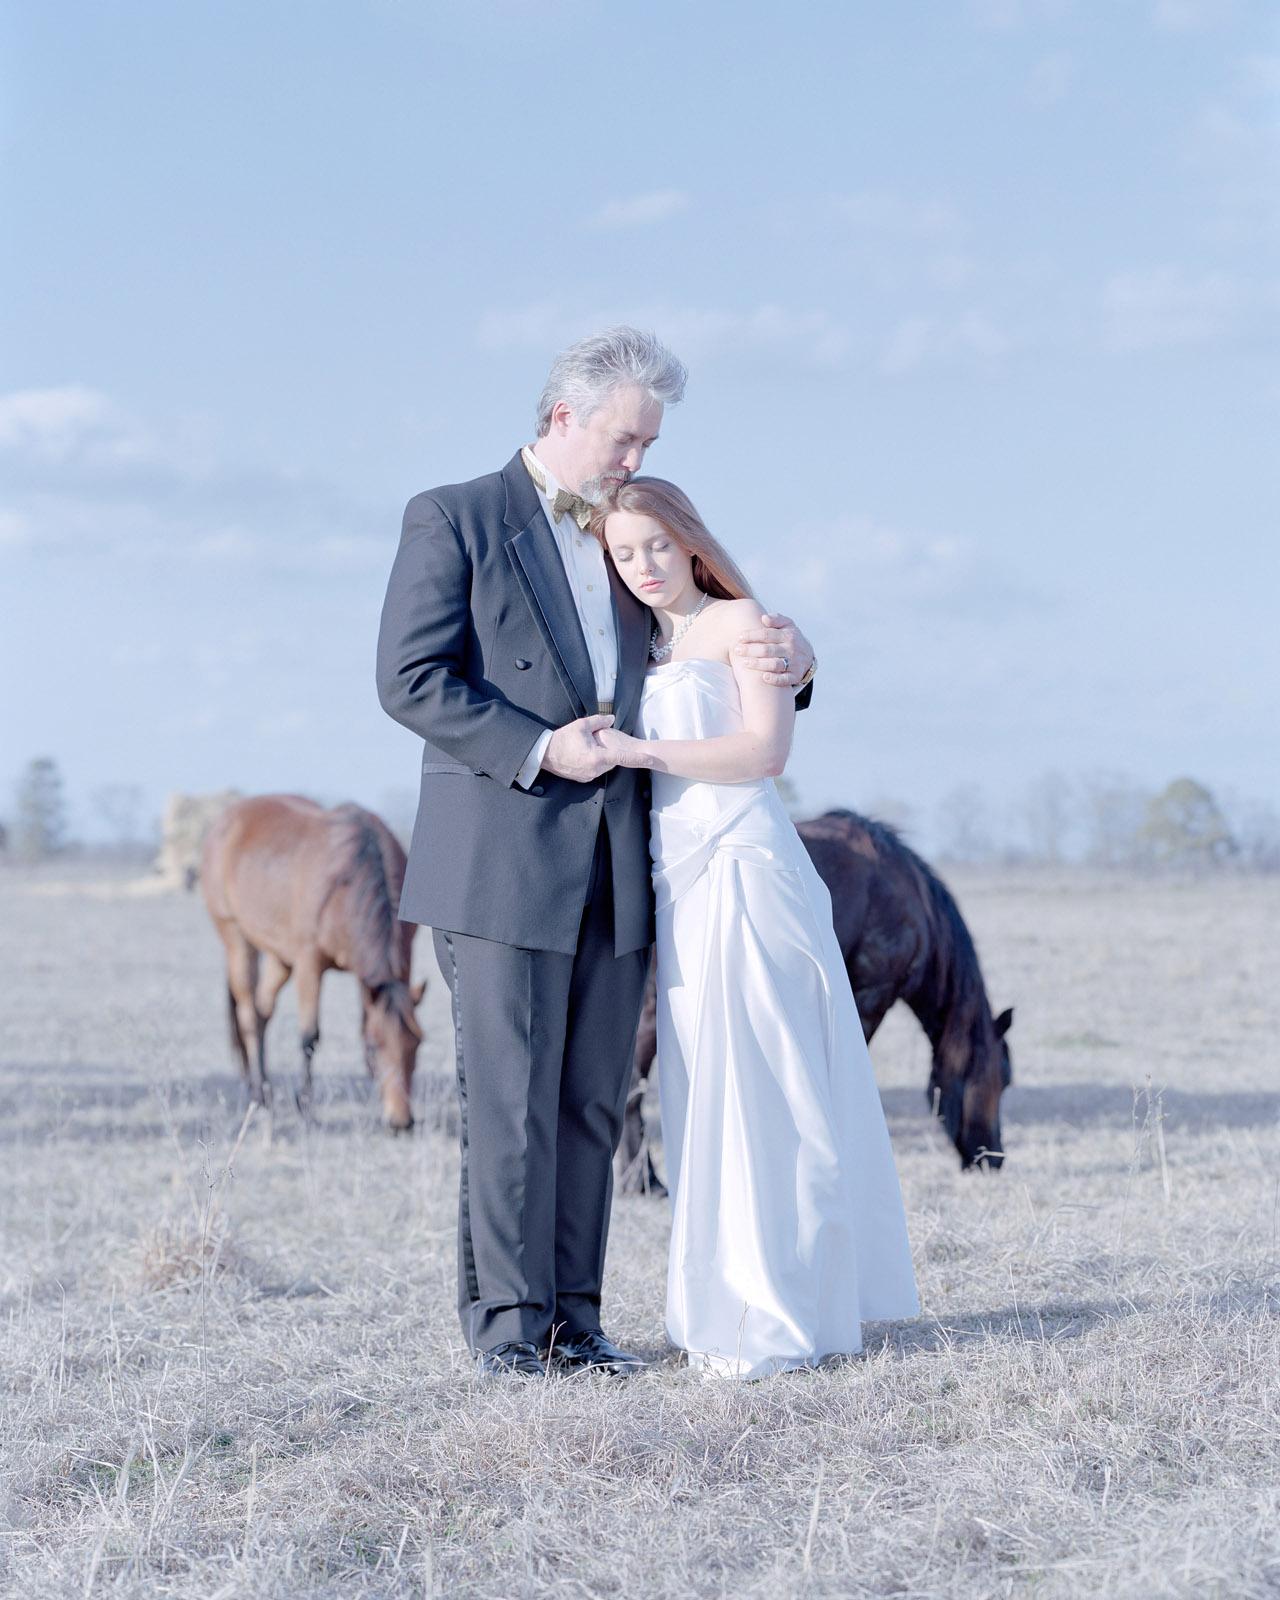 Pierce & Jasmine Nunley, Grand Cane, Louisiana